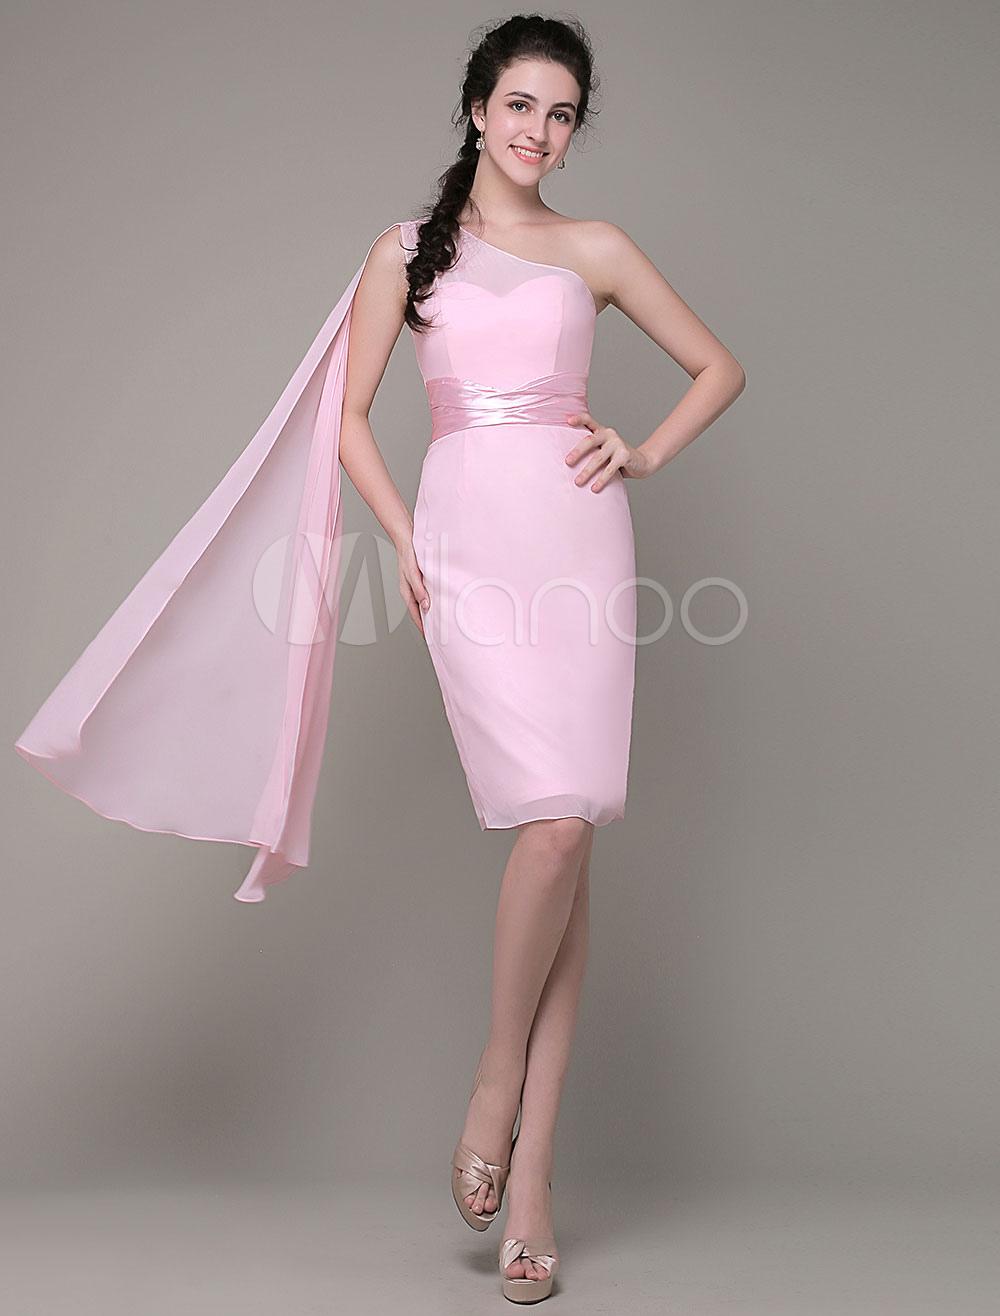 One-Shoulder Bridemaid dress Sheath Chiffon Pleated Knee-Length Party Dress Milanoo